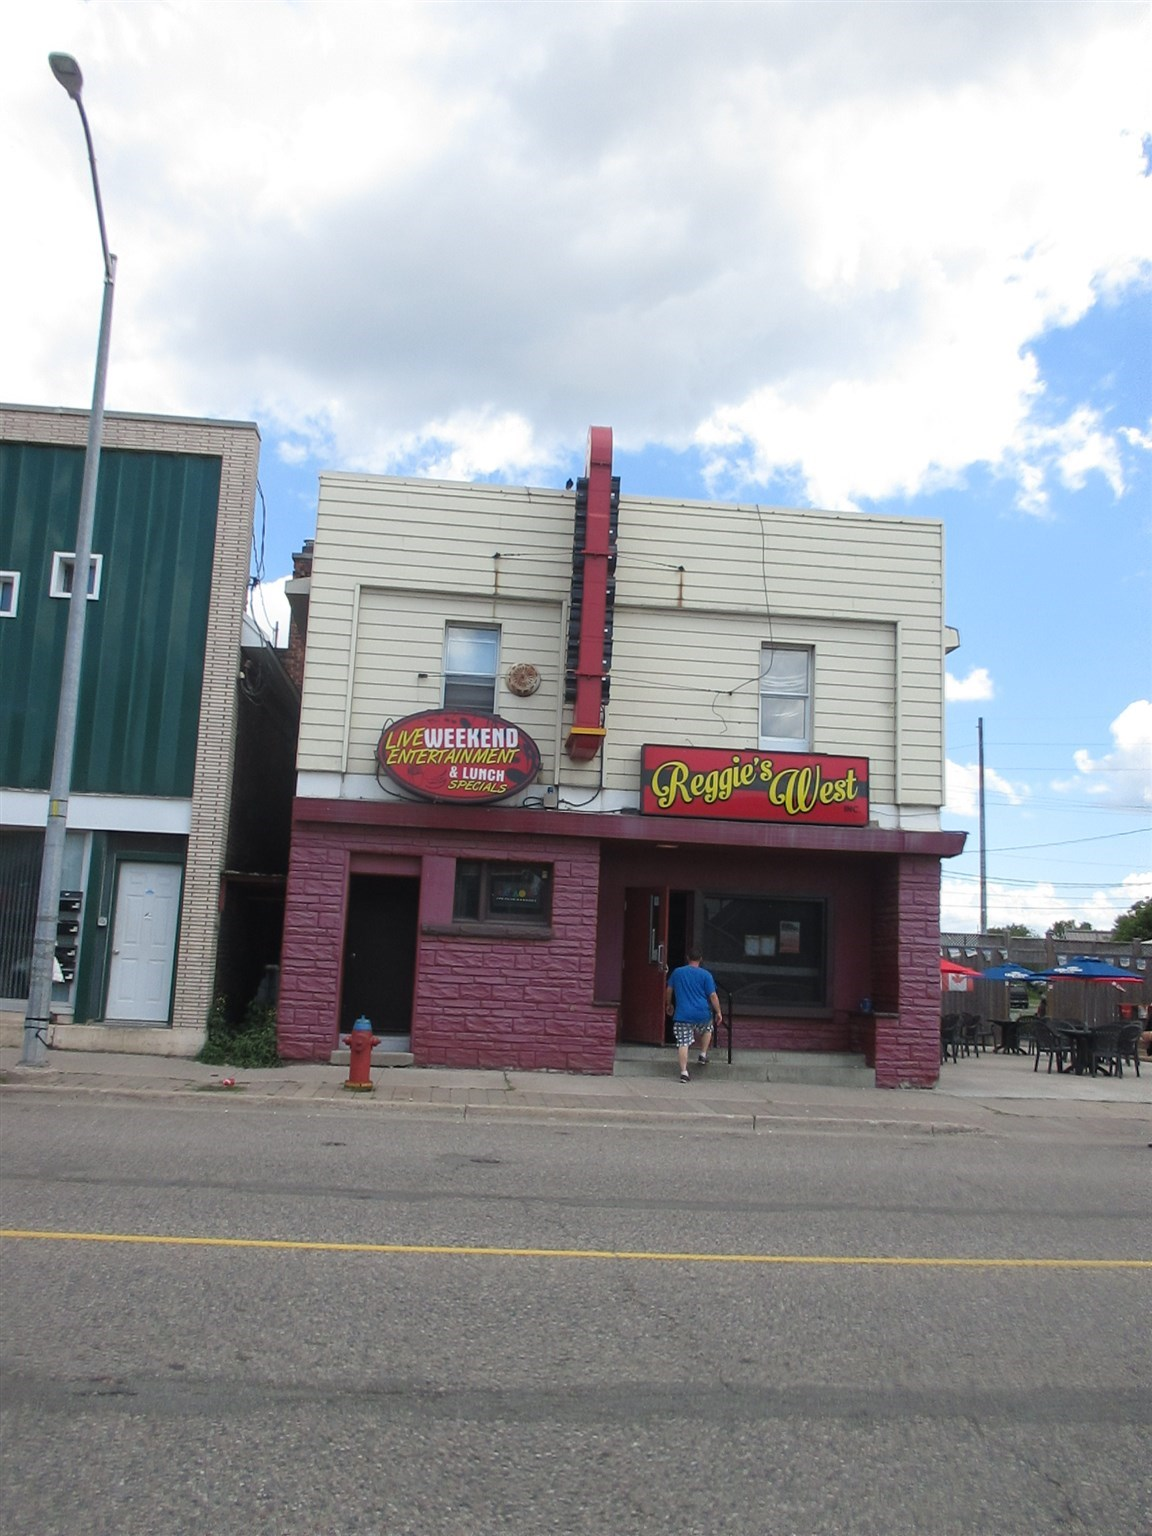 302-307 Korah Road, Sault Ste. Marie Ontario, Canada